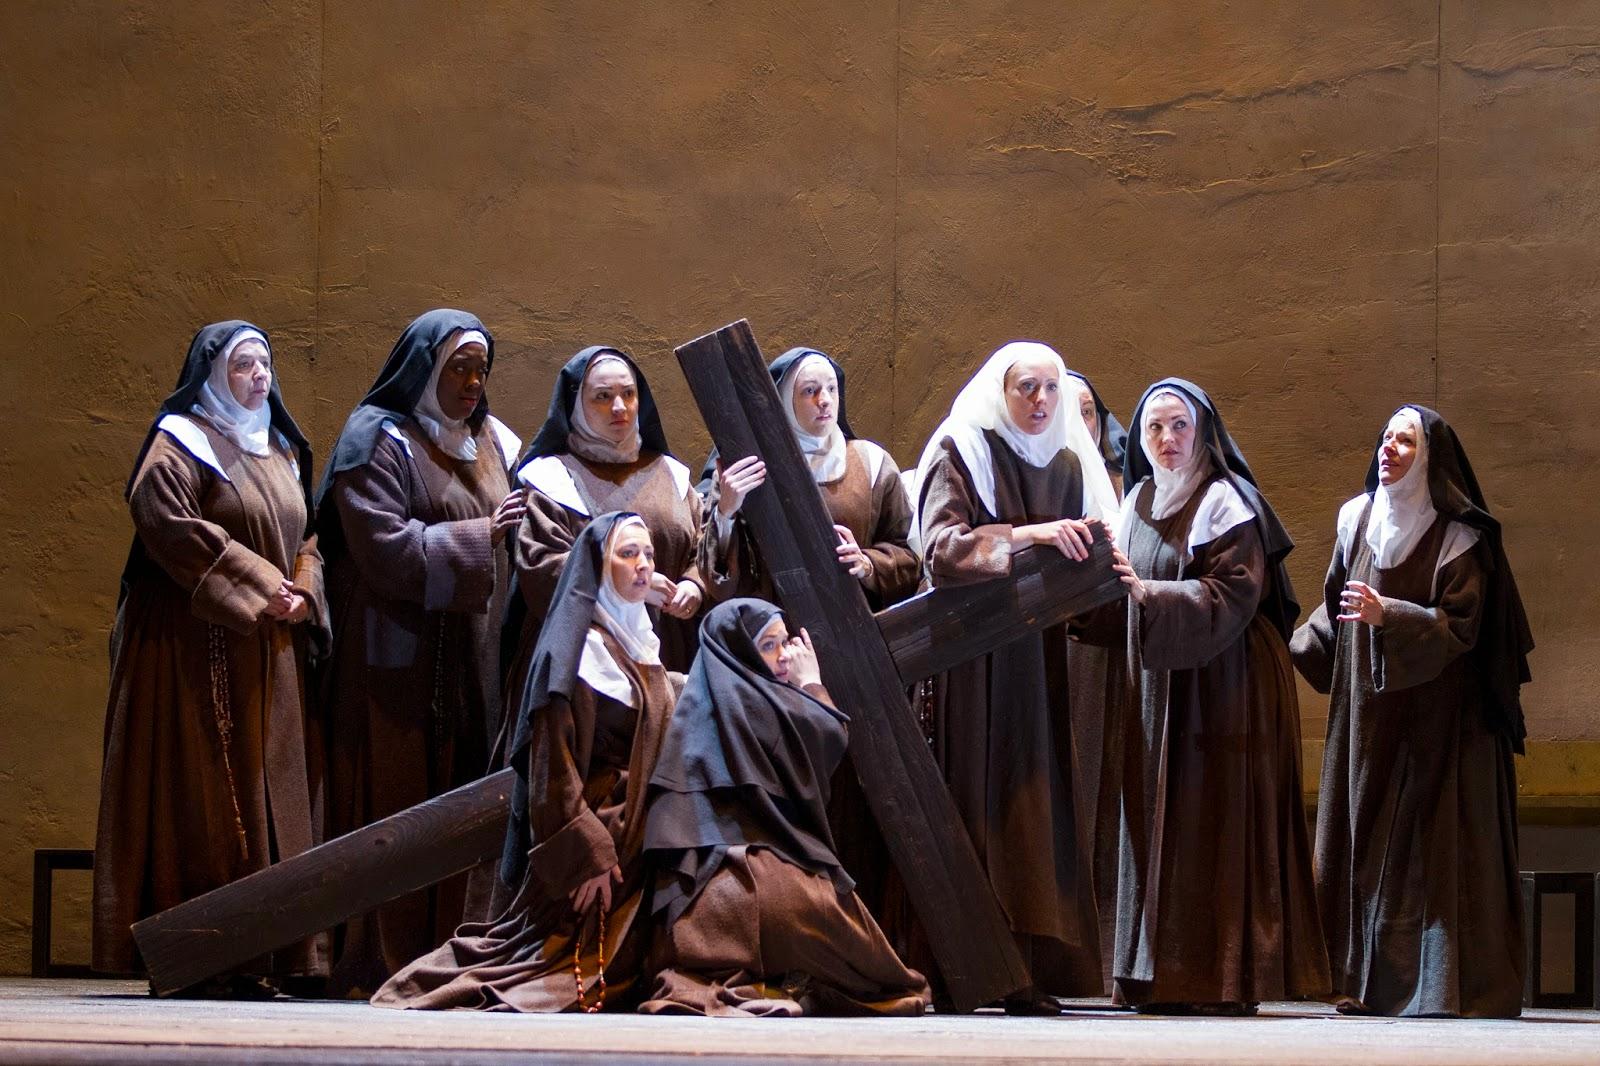 Carmelites_with_their_cross